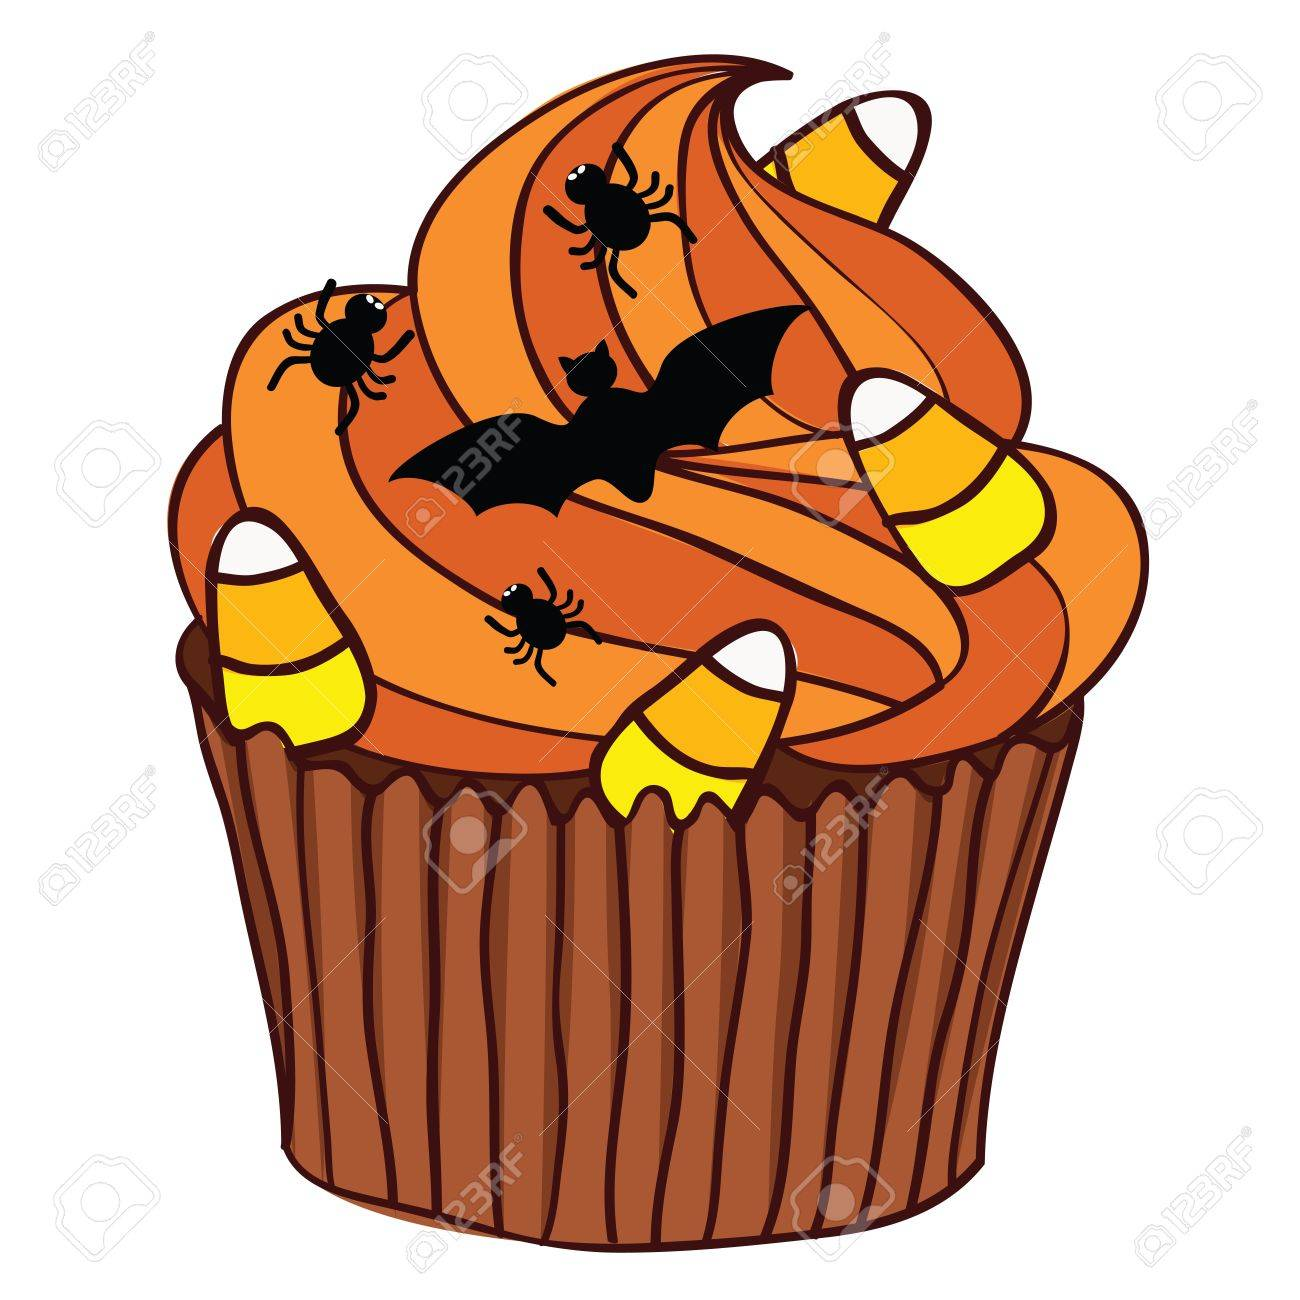 Halloween Spooky Cupcake with orange icing. Stock Vector - 10703613